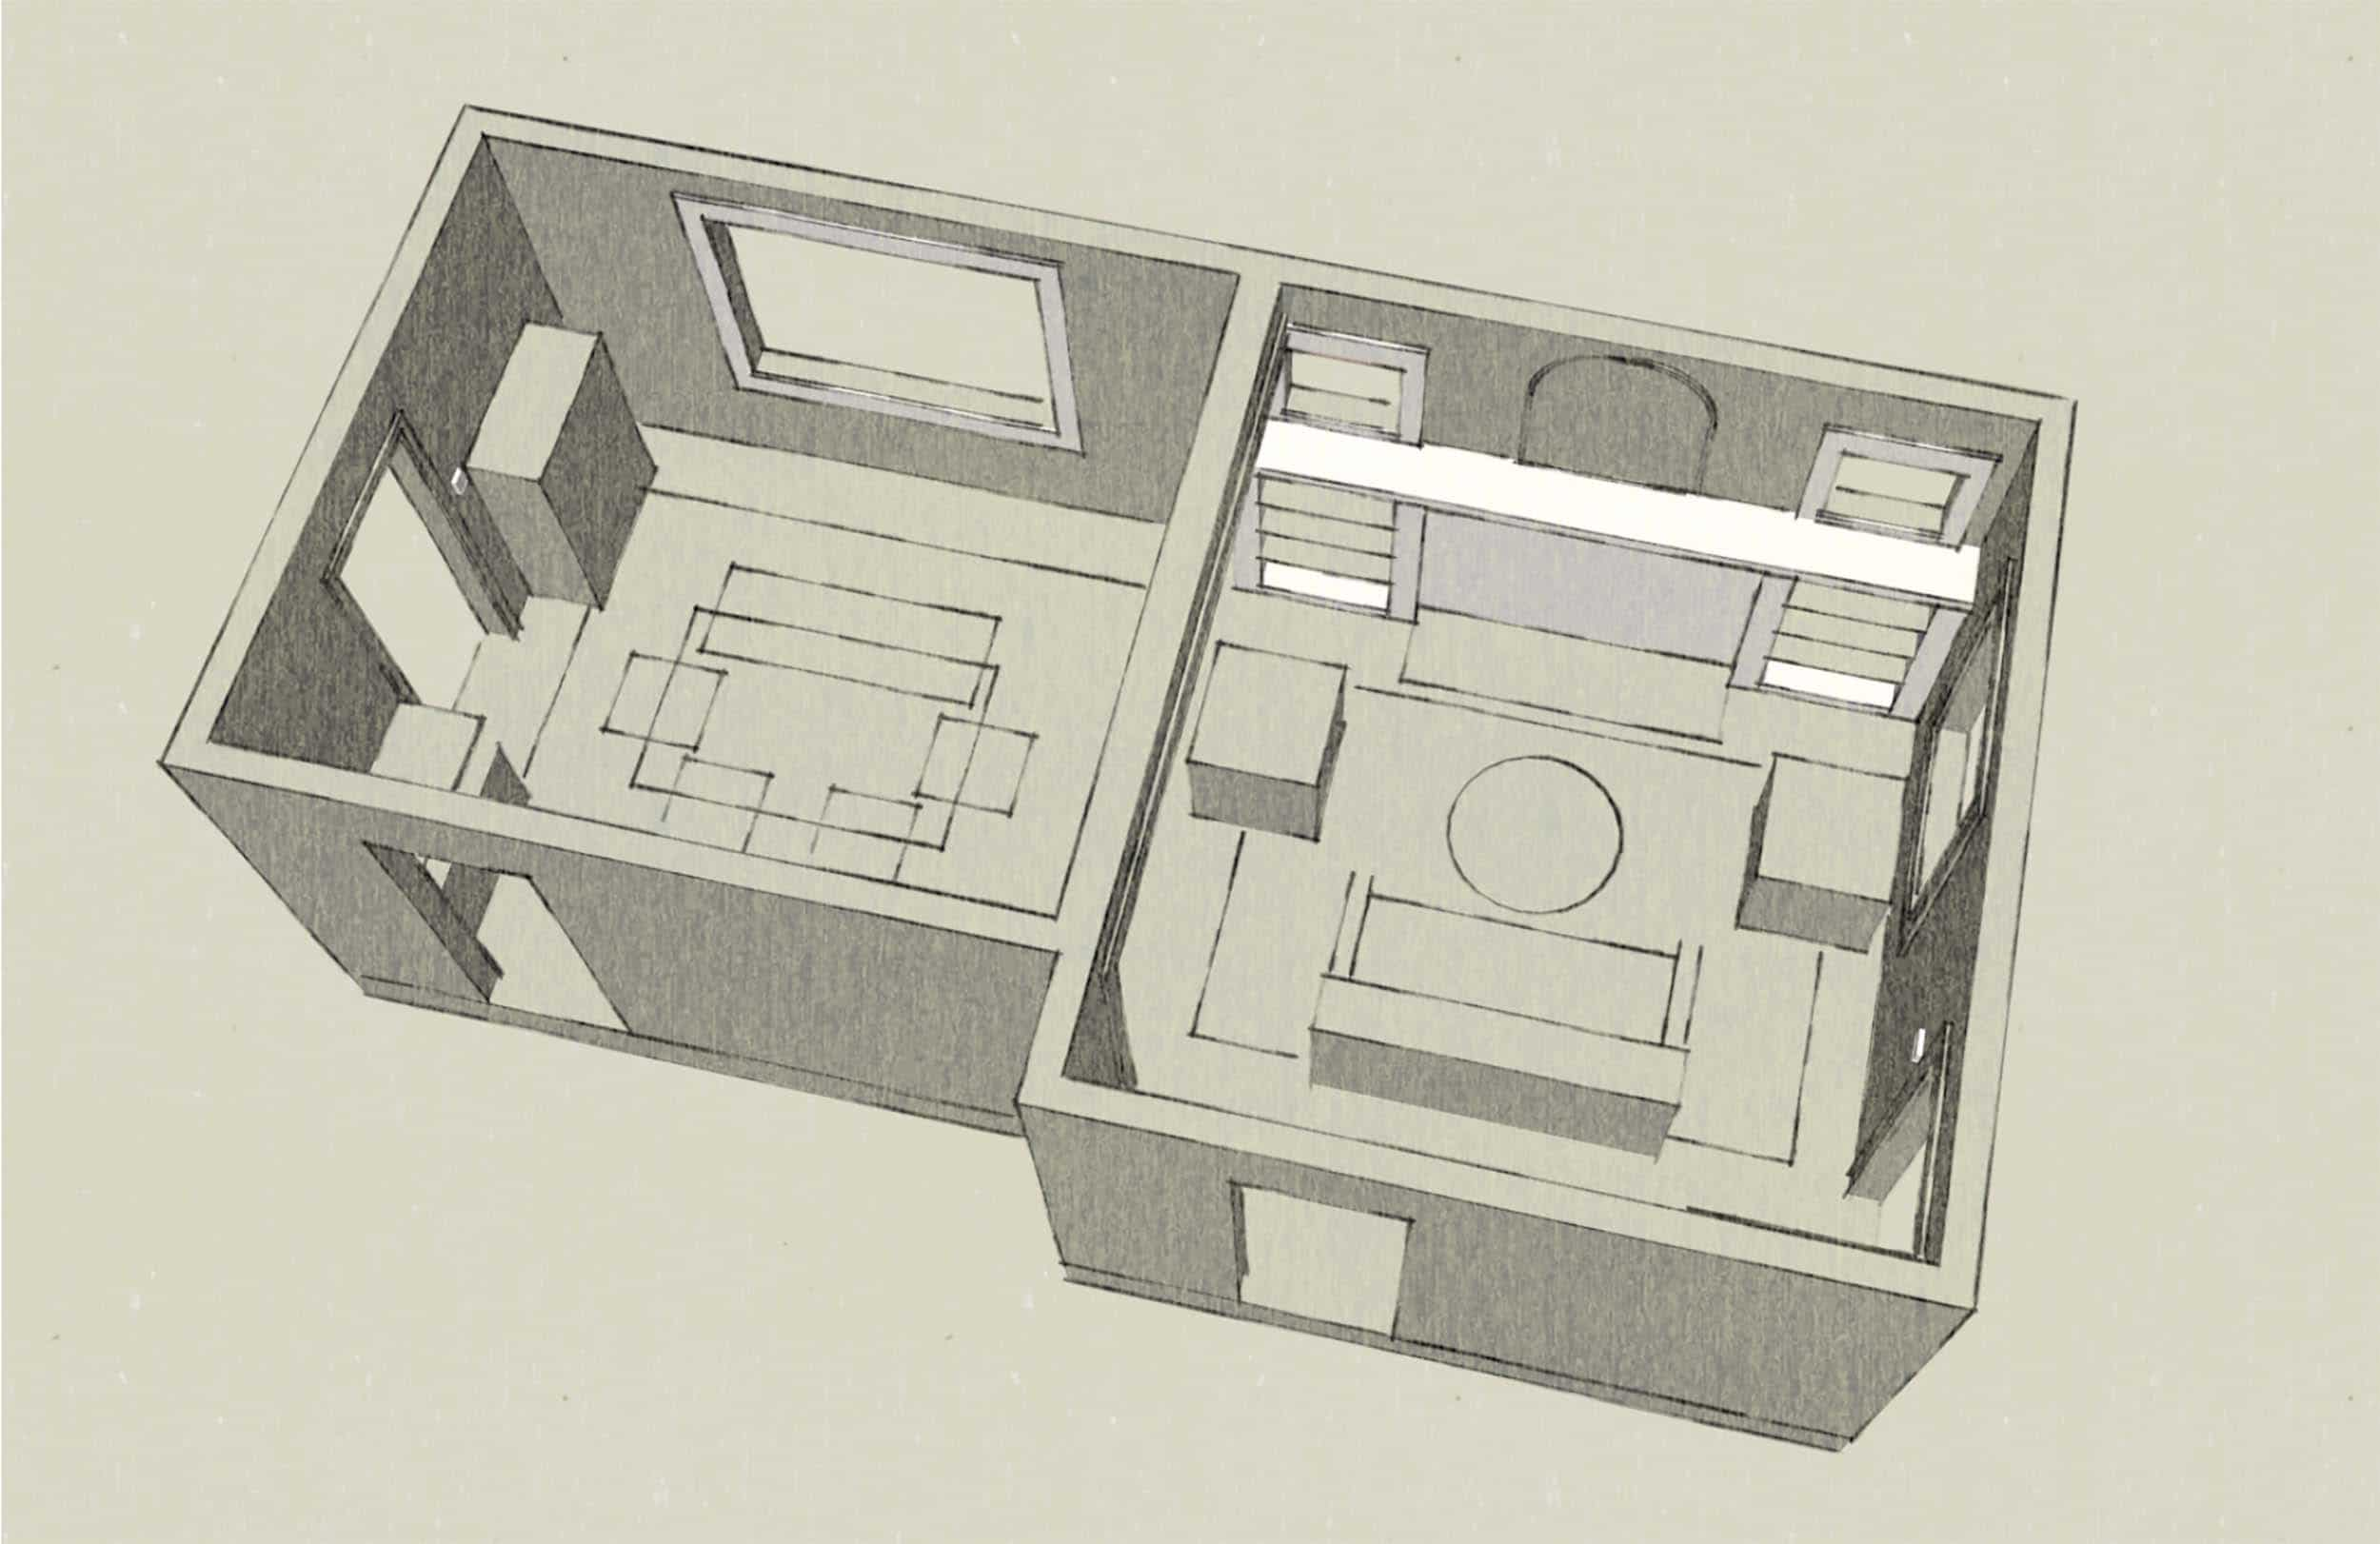 Sara & Mac Design Process Layout Idea 1